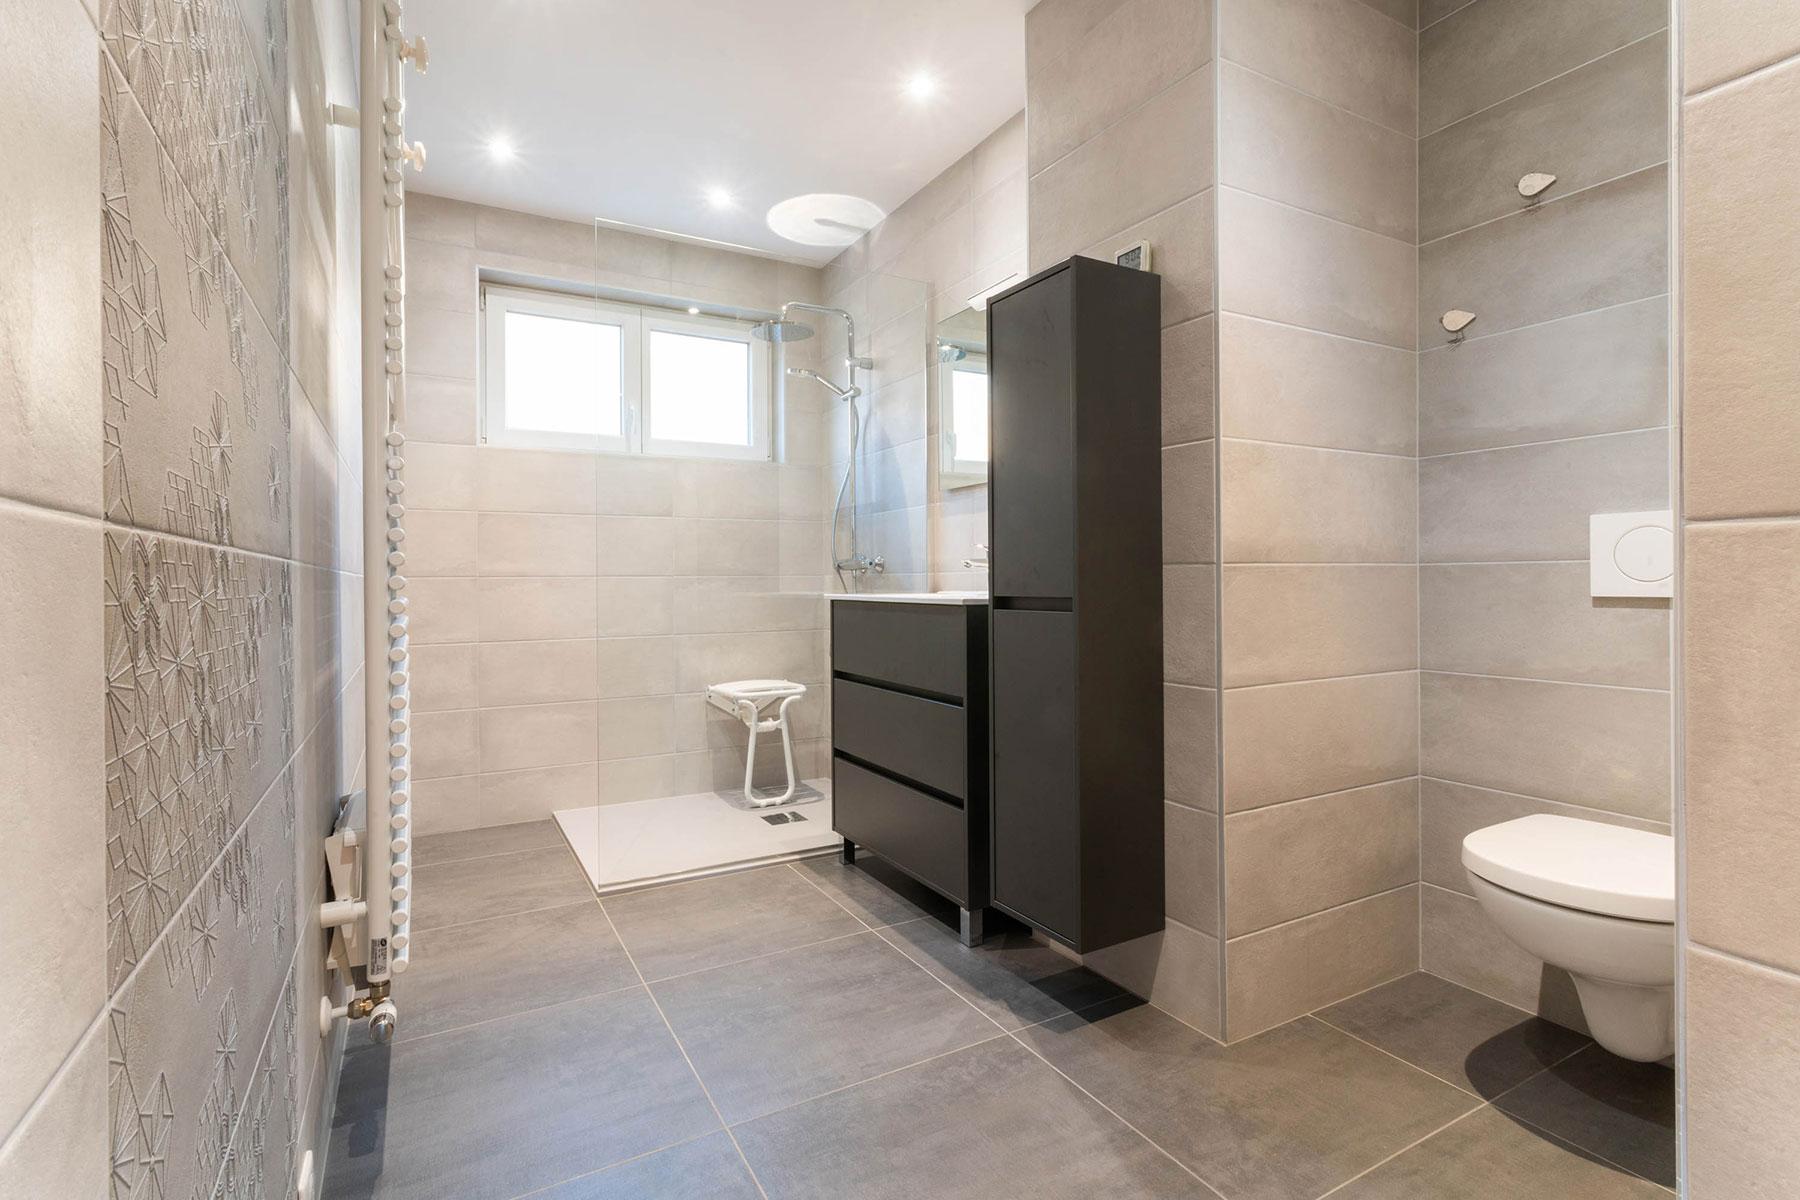 rénovation salle de bains munster 7